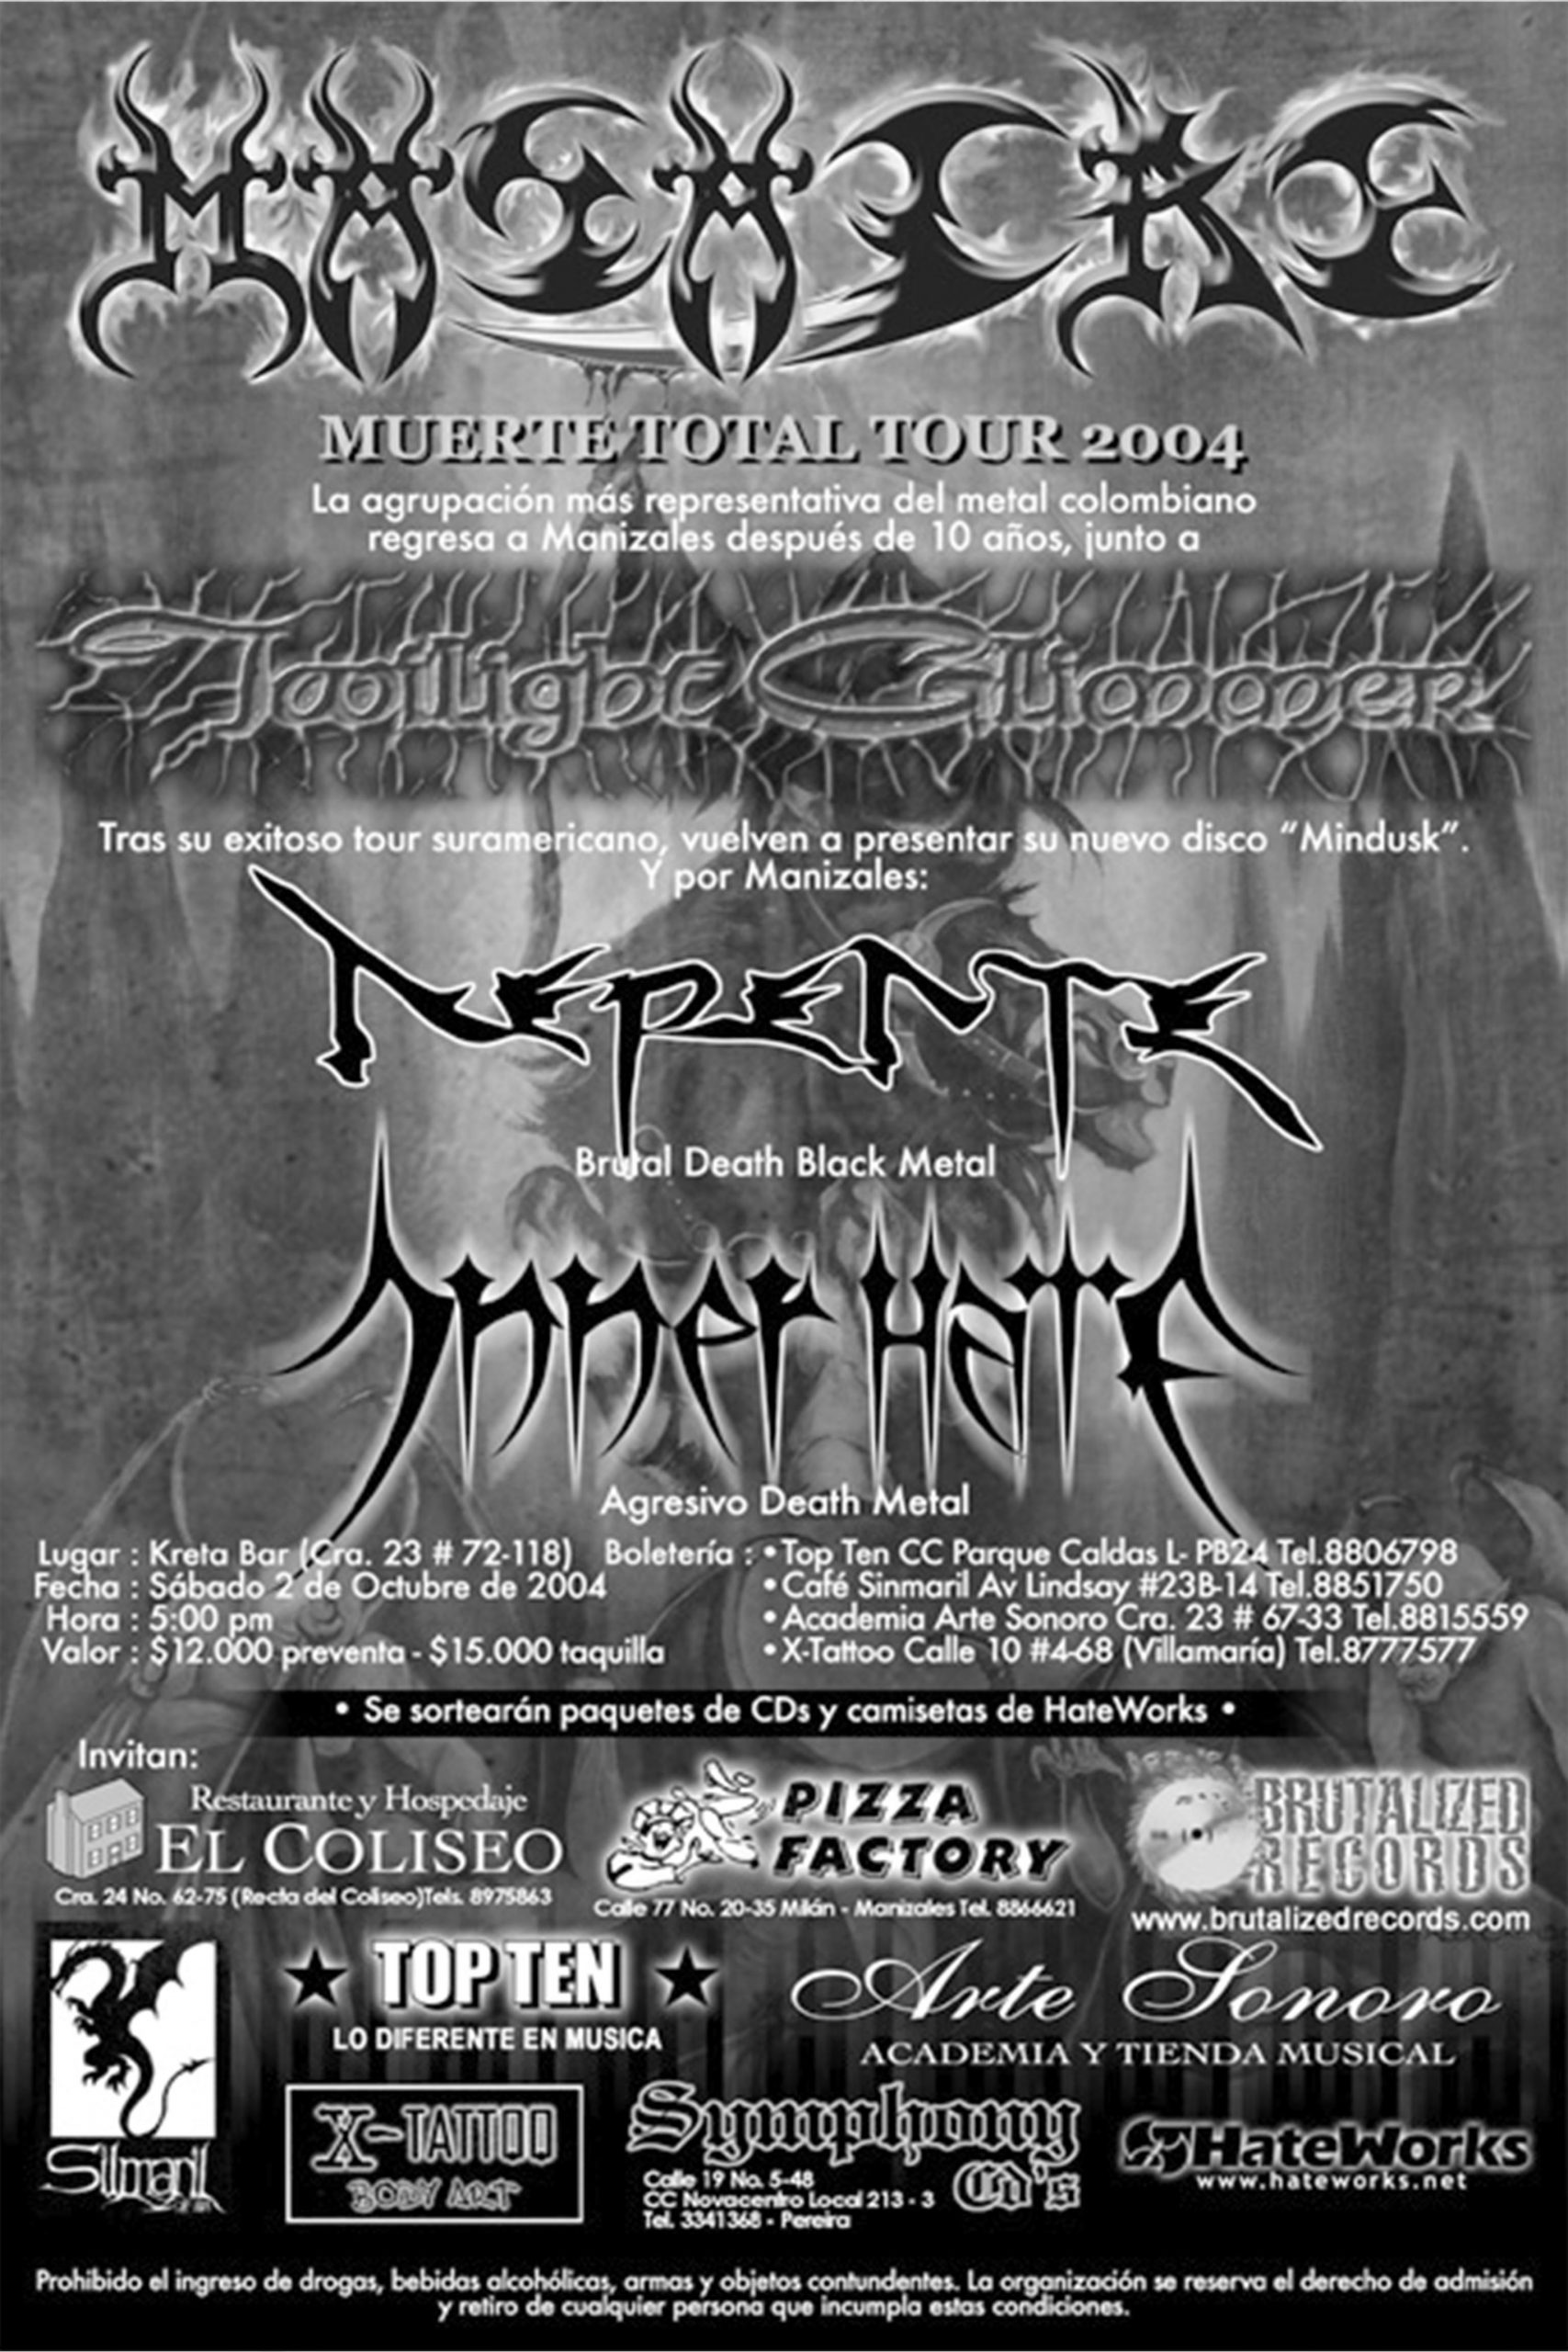 Muerte Total Tour 2004